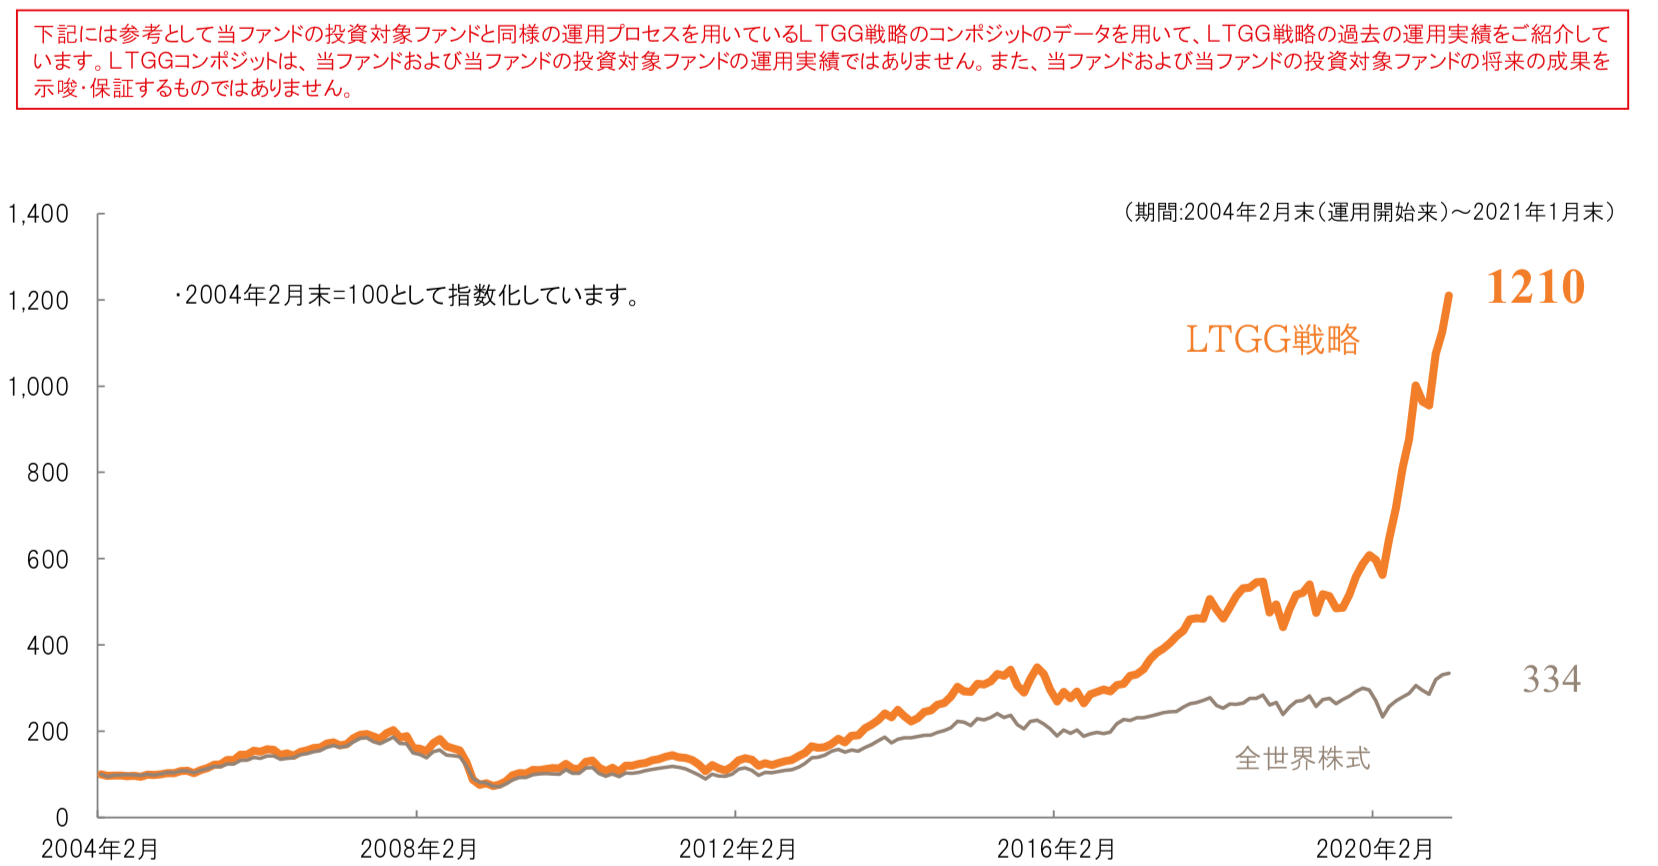 LTGG戦略の過去からのリターン